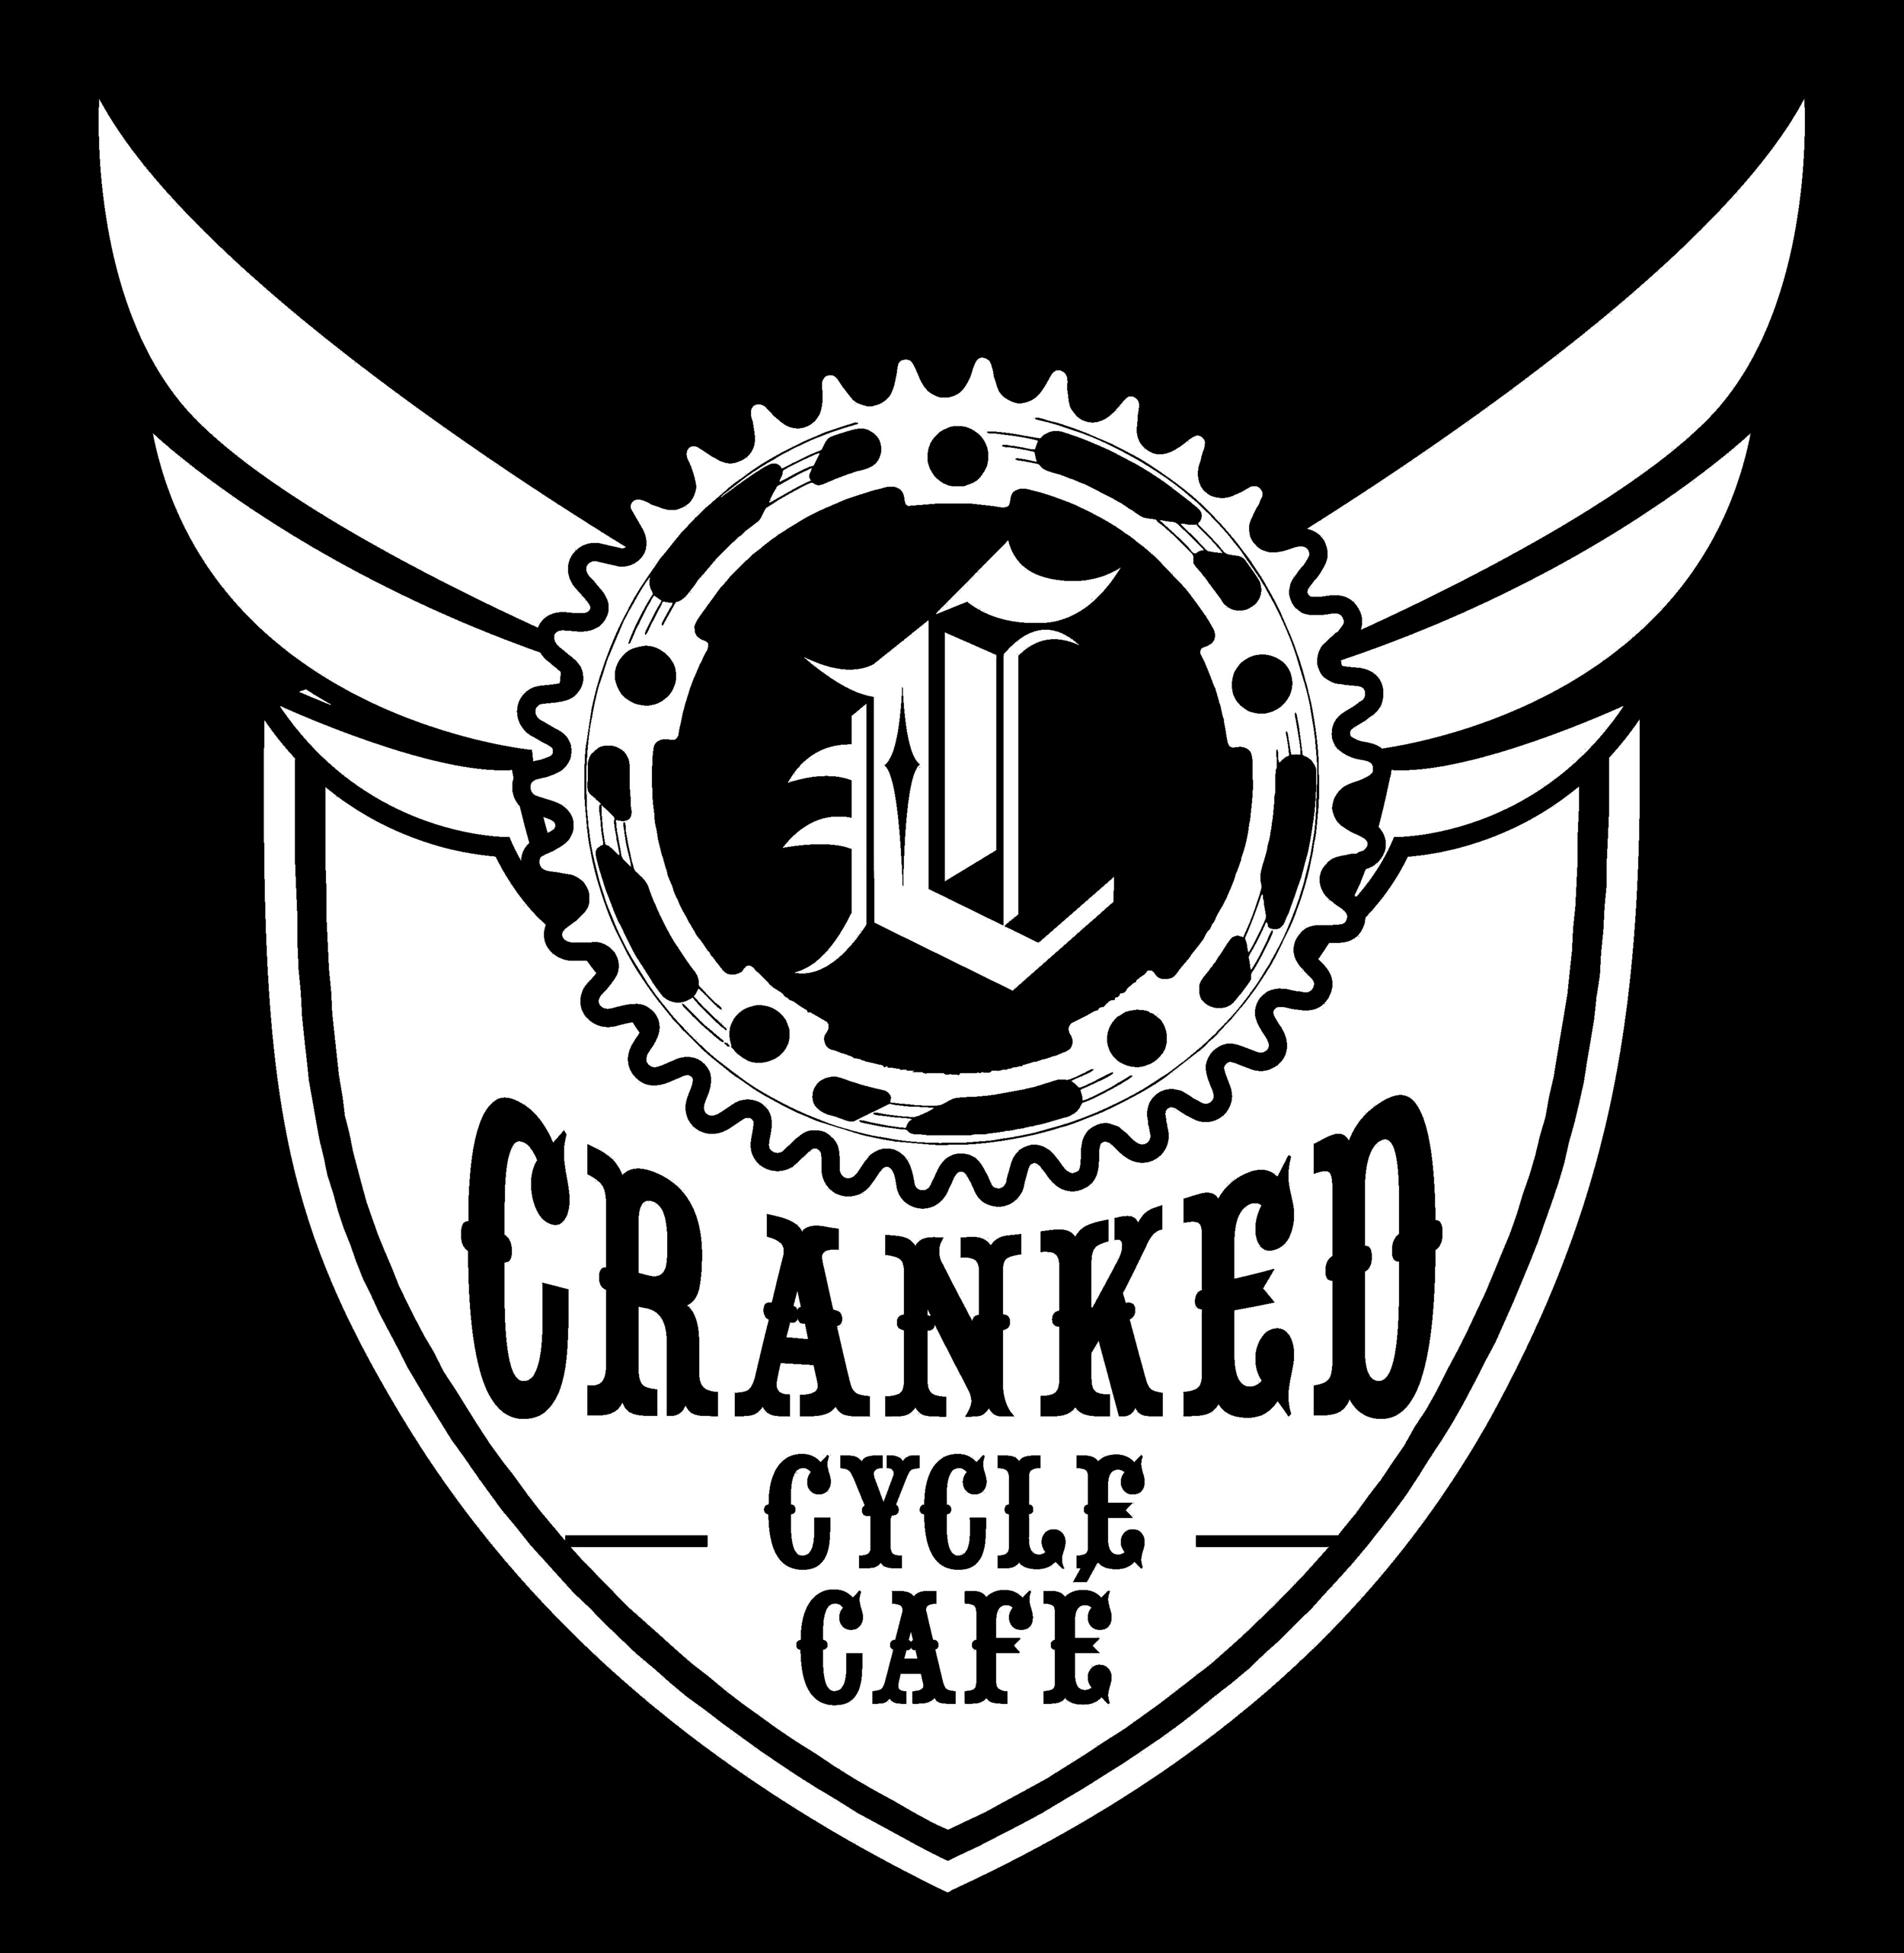 Crankedcafeinvert.png